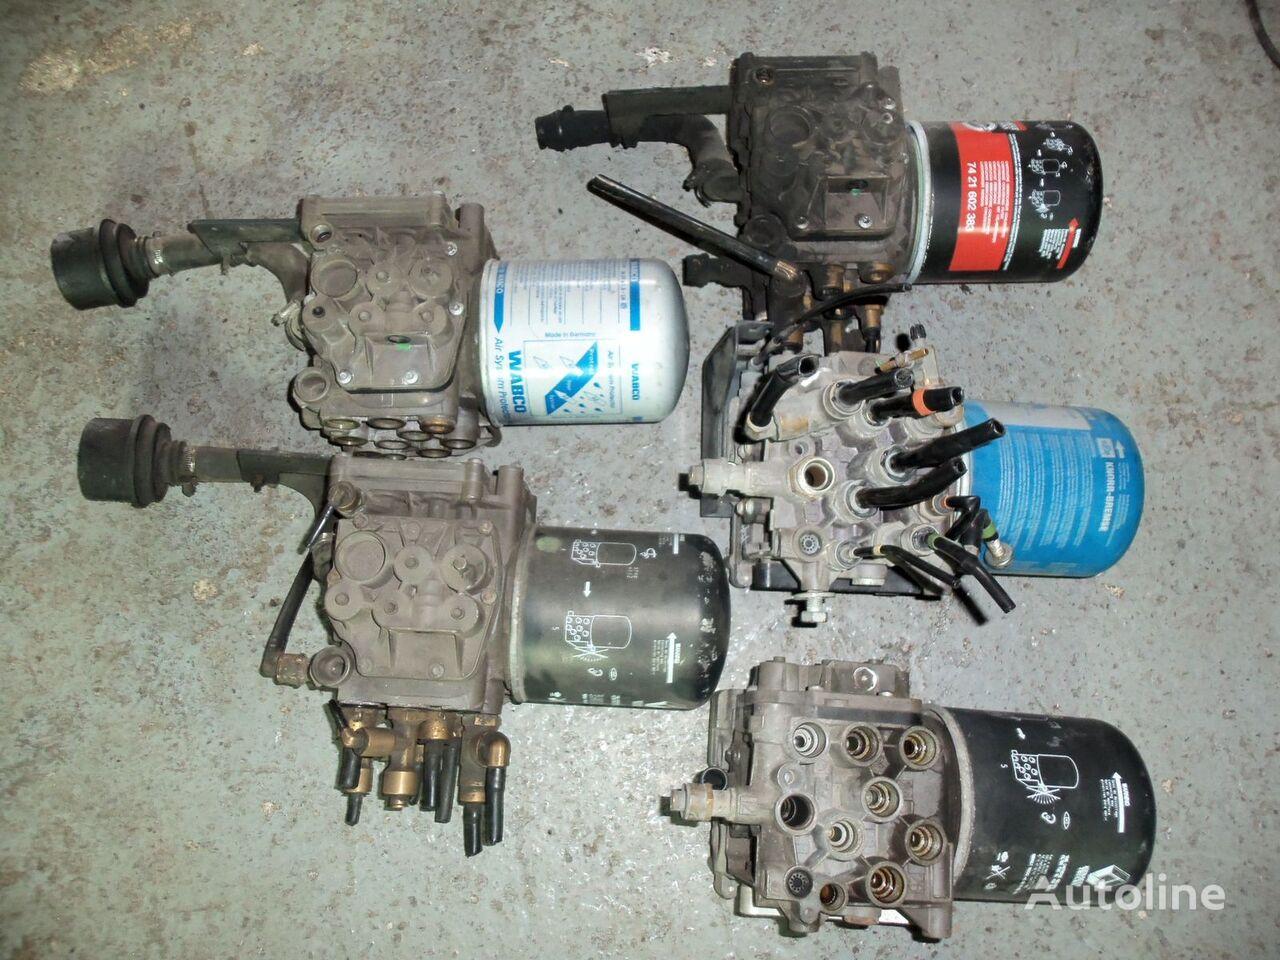 кран RENAULT , air dryer APM, 5010457873, E для тягача RENAULT Premium DXI, Magnum DXI, Kerax DXI